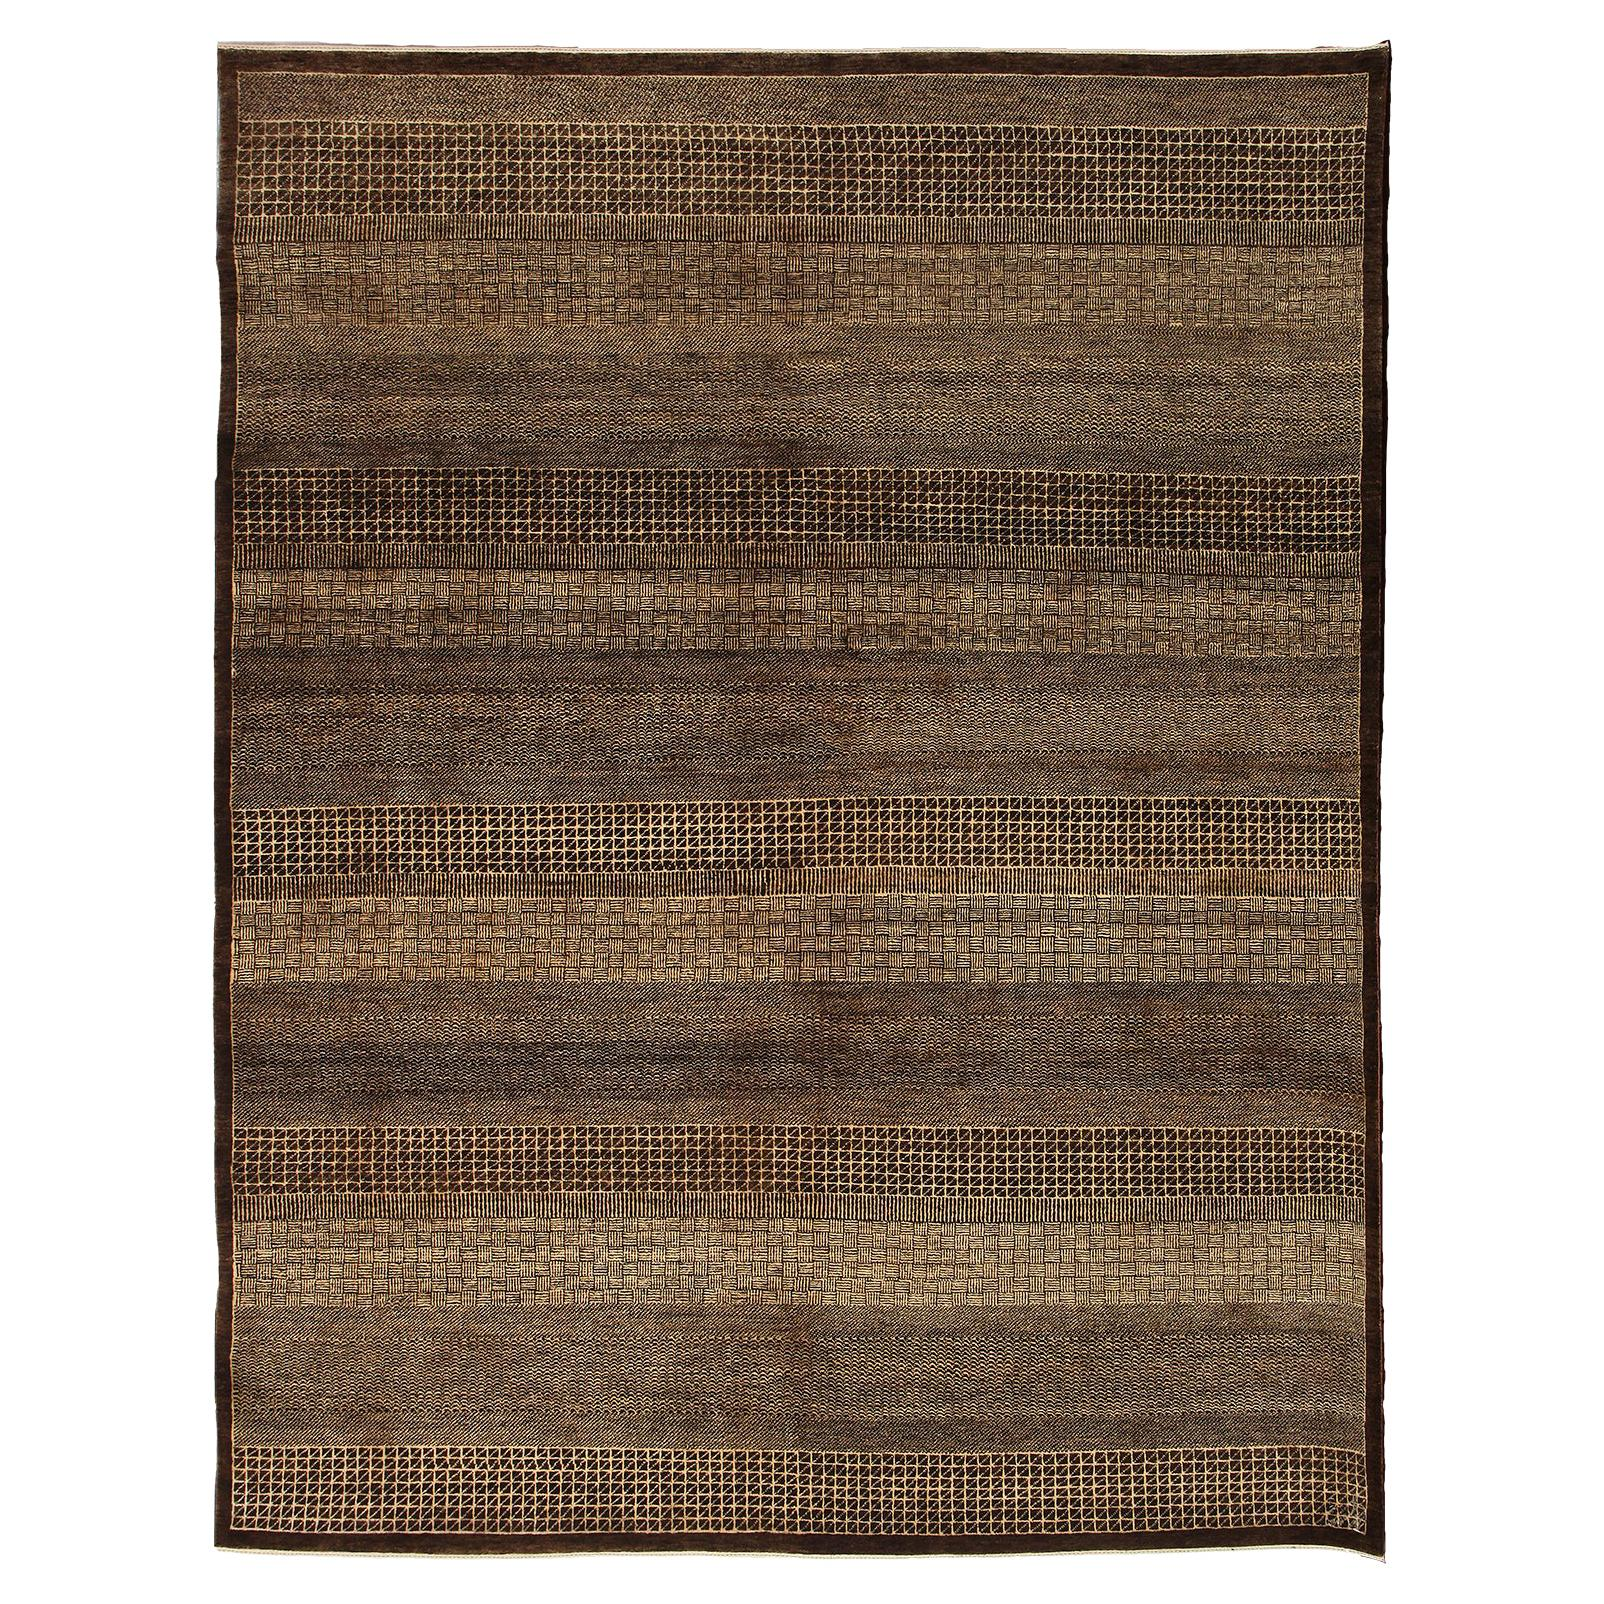 Contemporary Brown and Cream Minimalist Persian Carpet